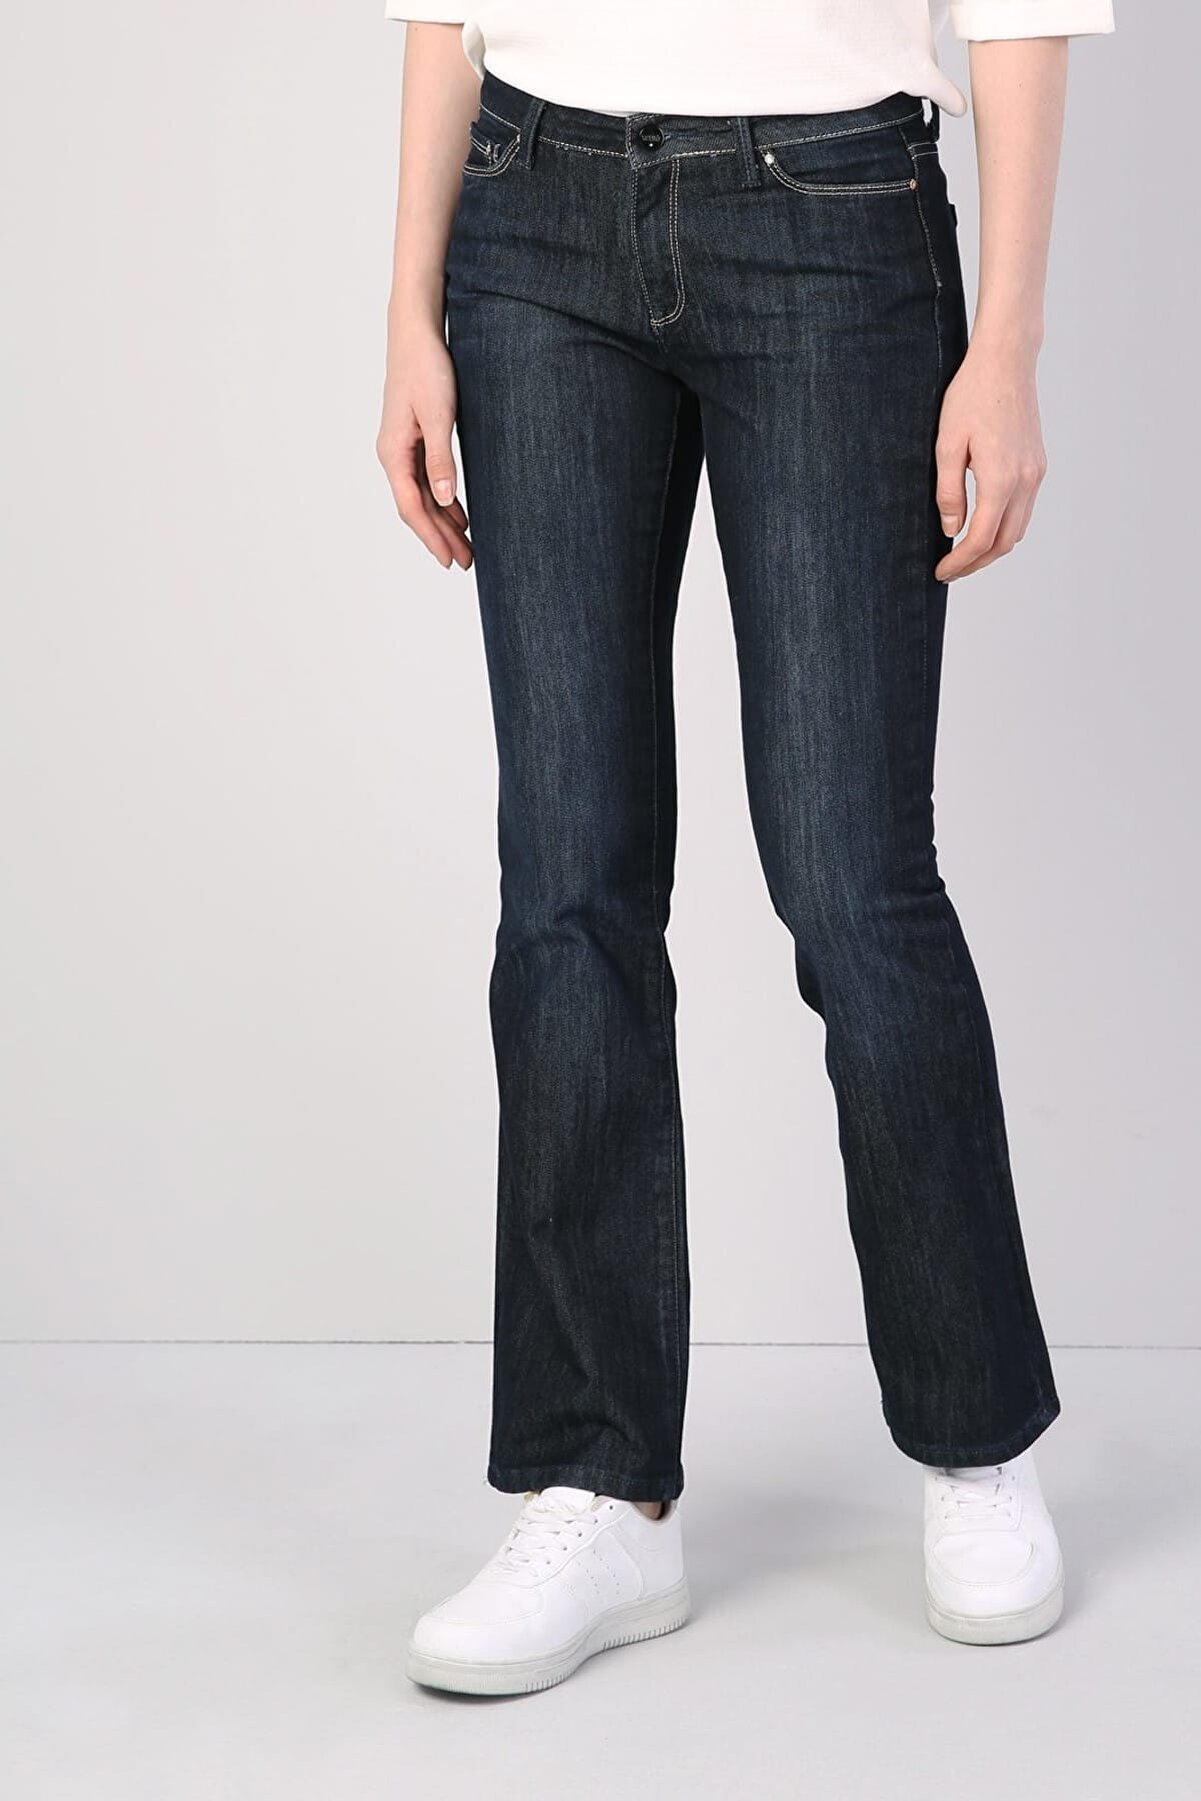 Colin's KADIN 791 Monıca Orta Bel Rahat Paça Regular Fit Mavi Kadın Jean Pantolon CL1041249